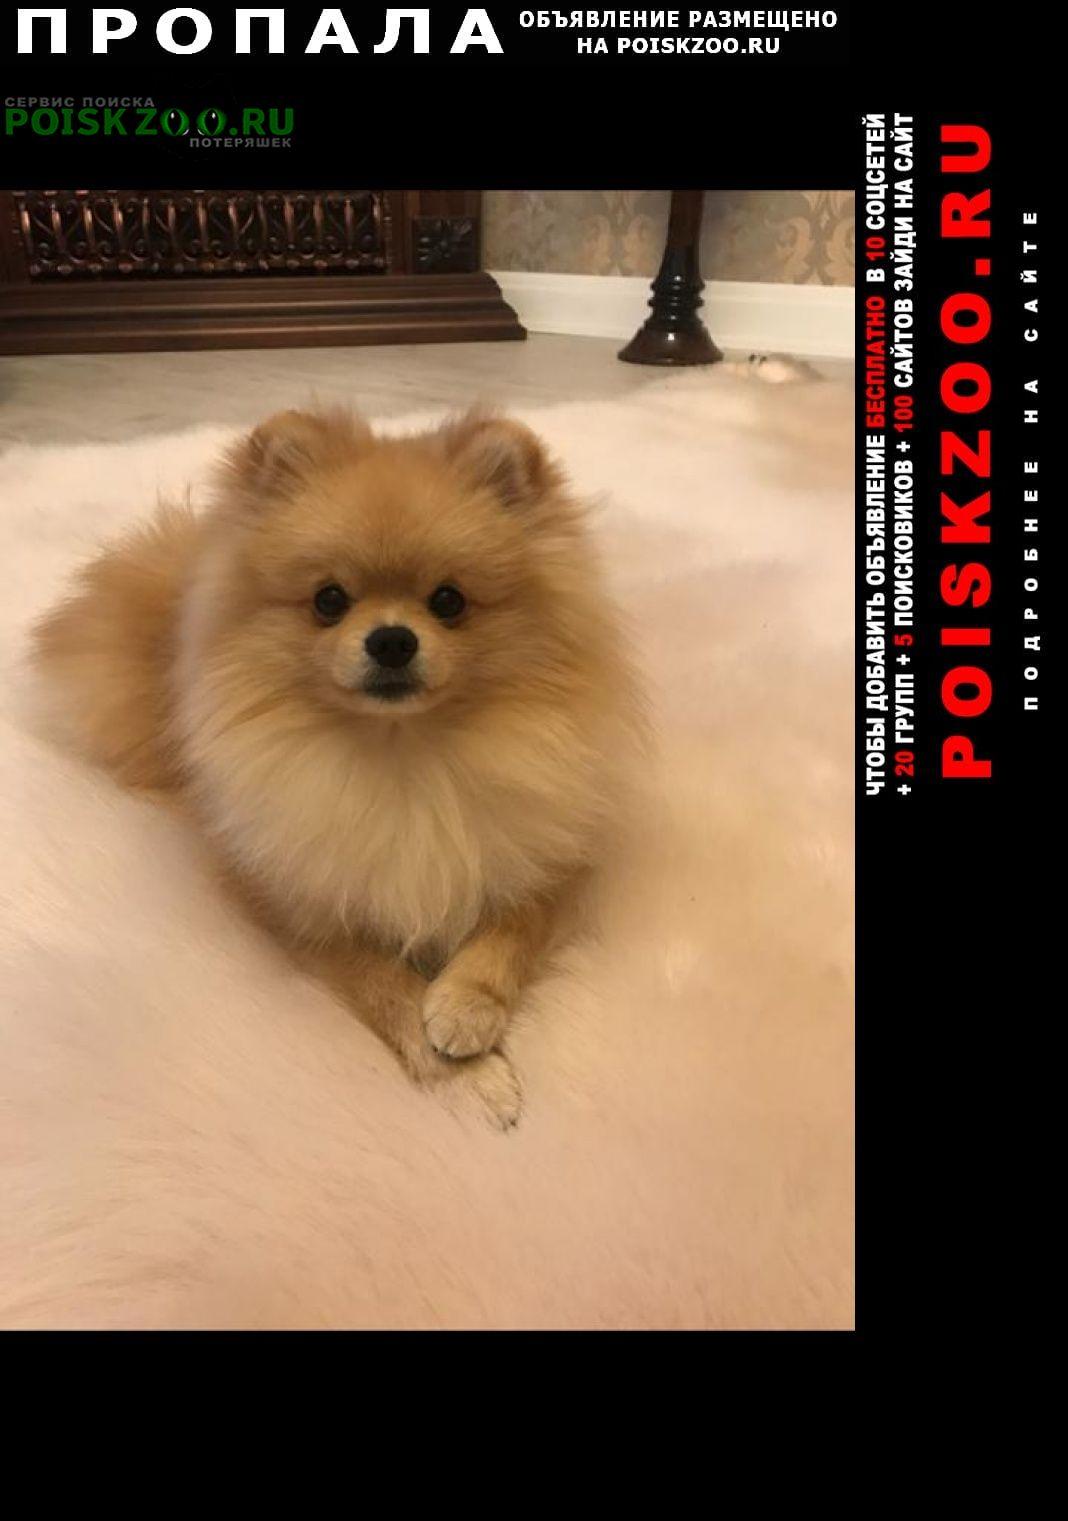 Пропала собака шпиц Красноярск